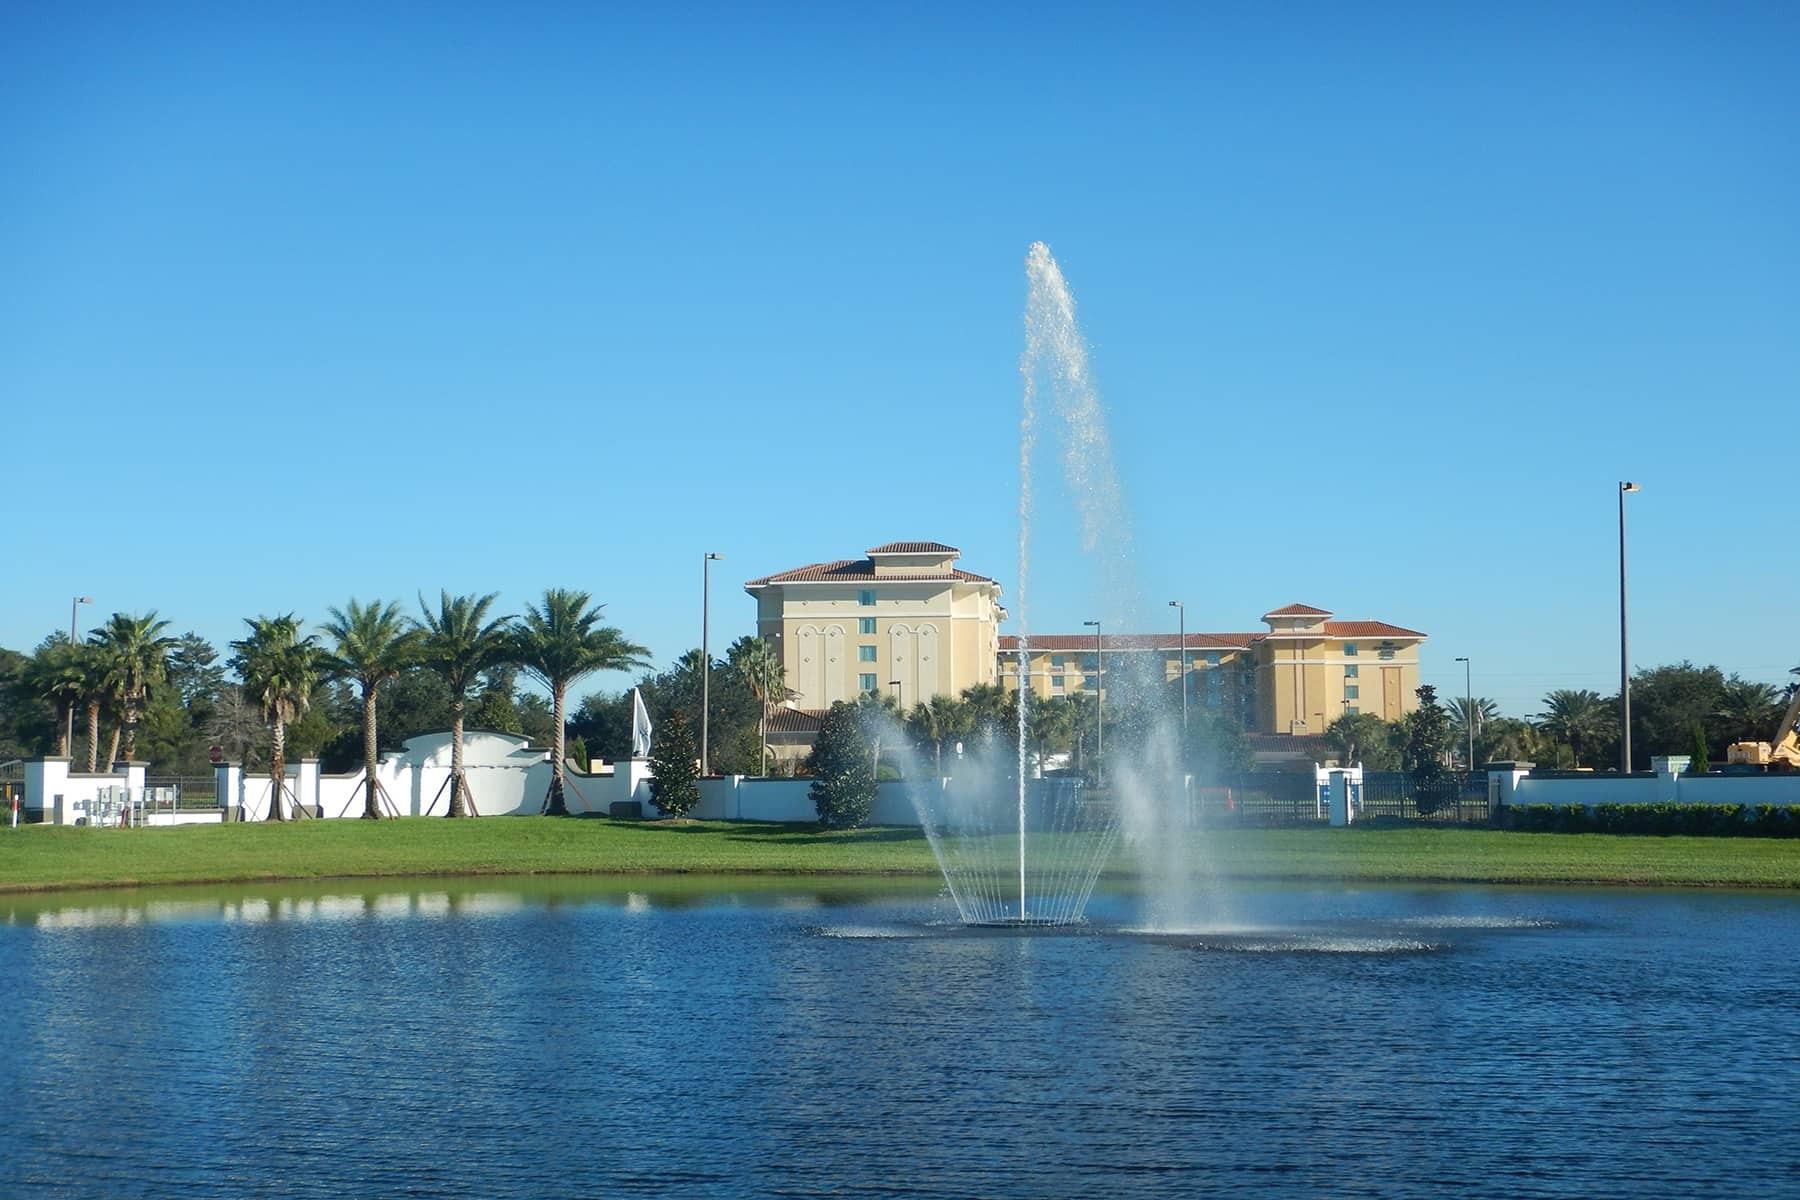 Ruby Lake Fountain